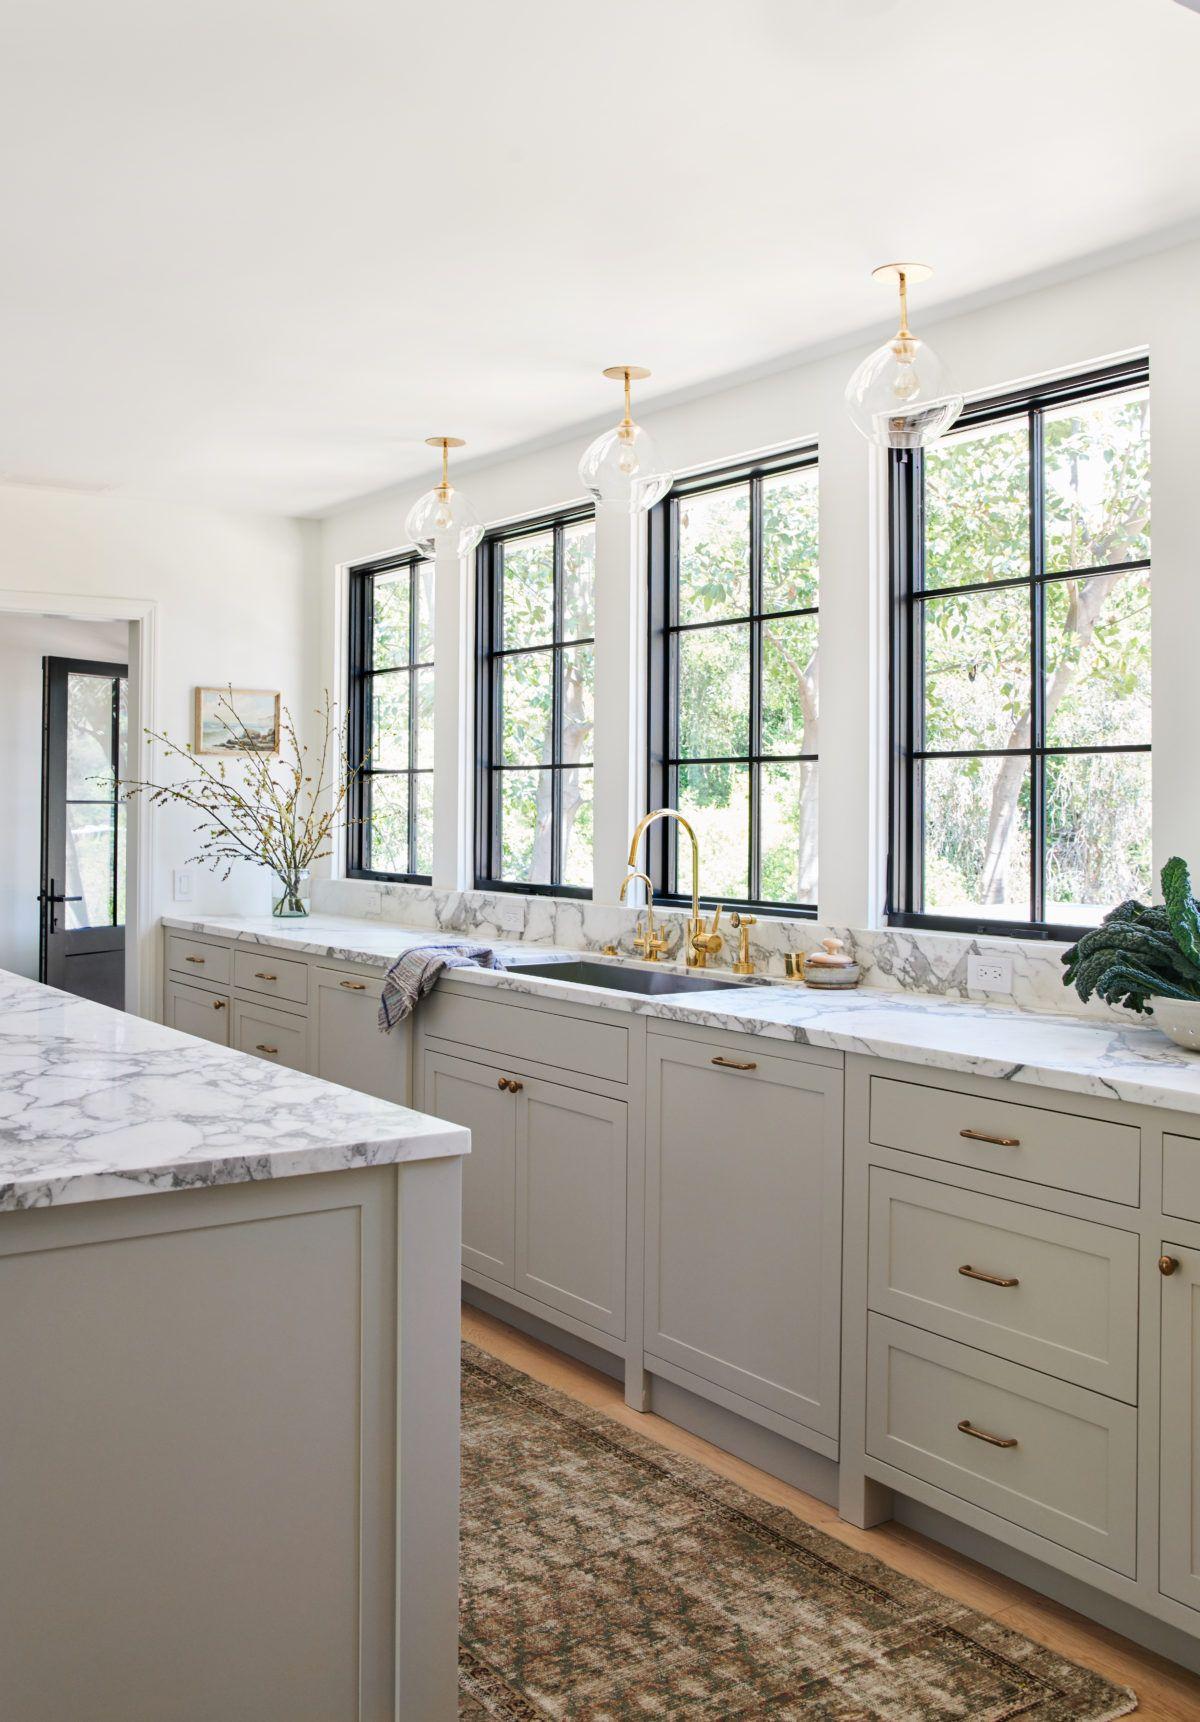 Best Client Canyon Cool Kitchen Cabinet Colors Paint For 400 x 300